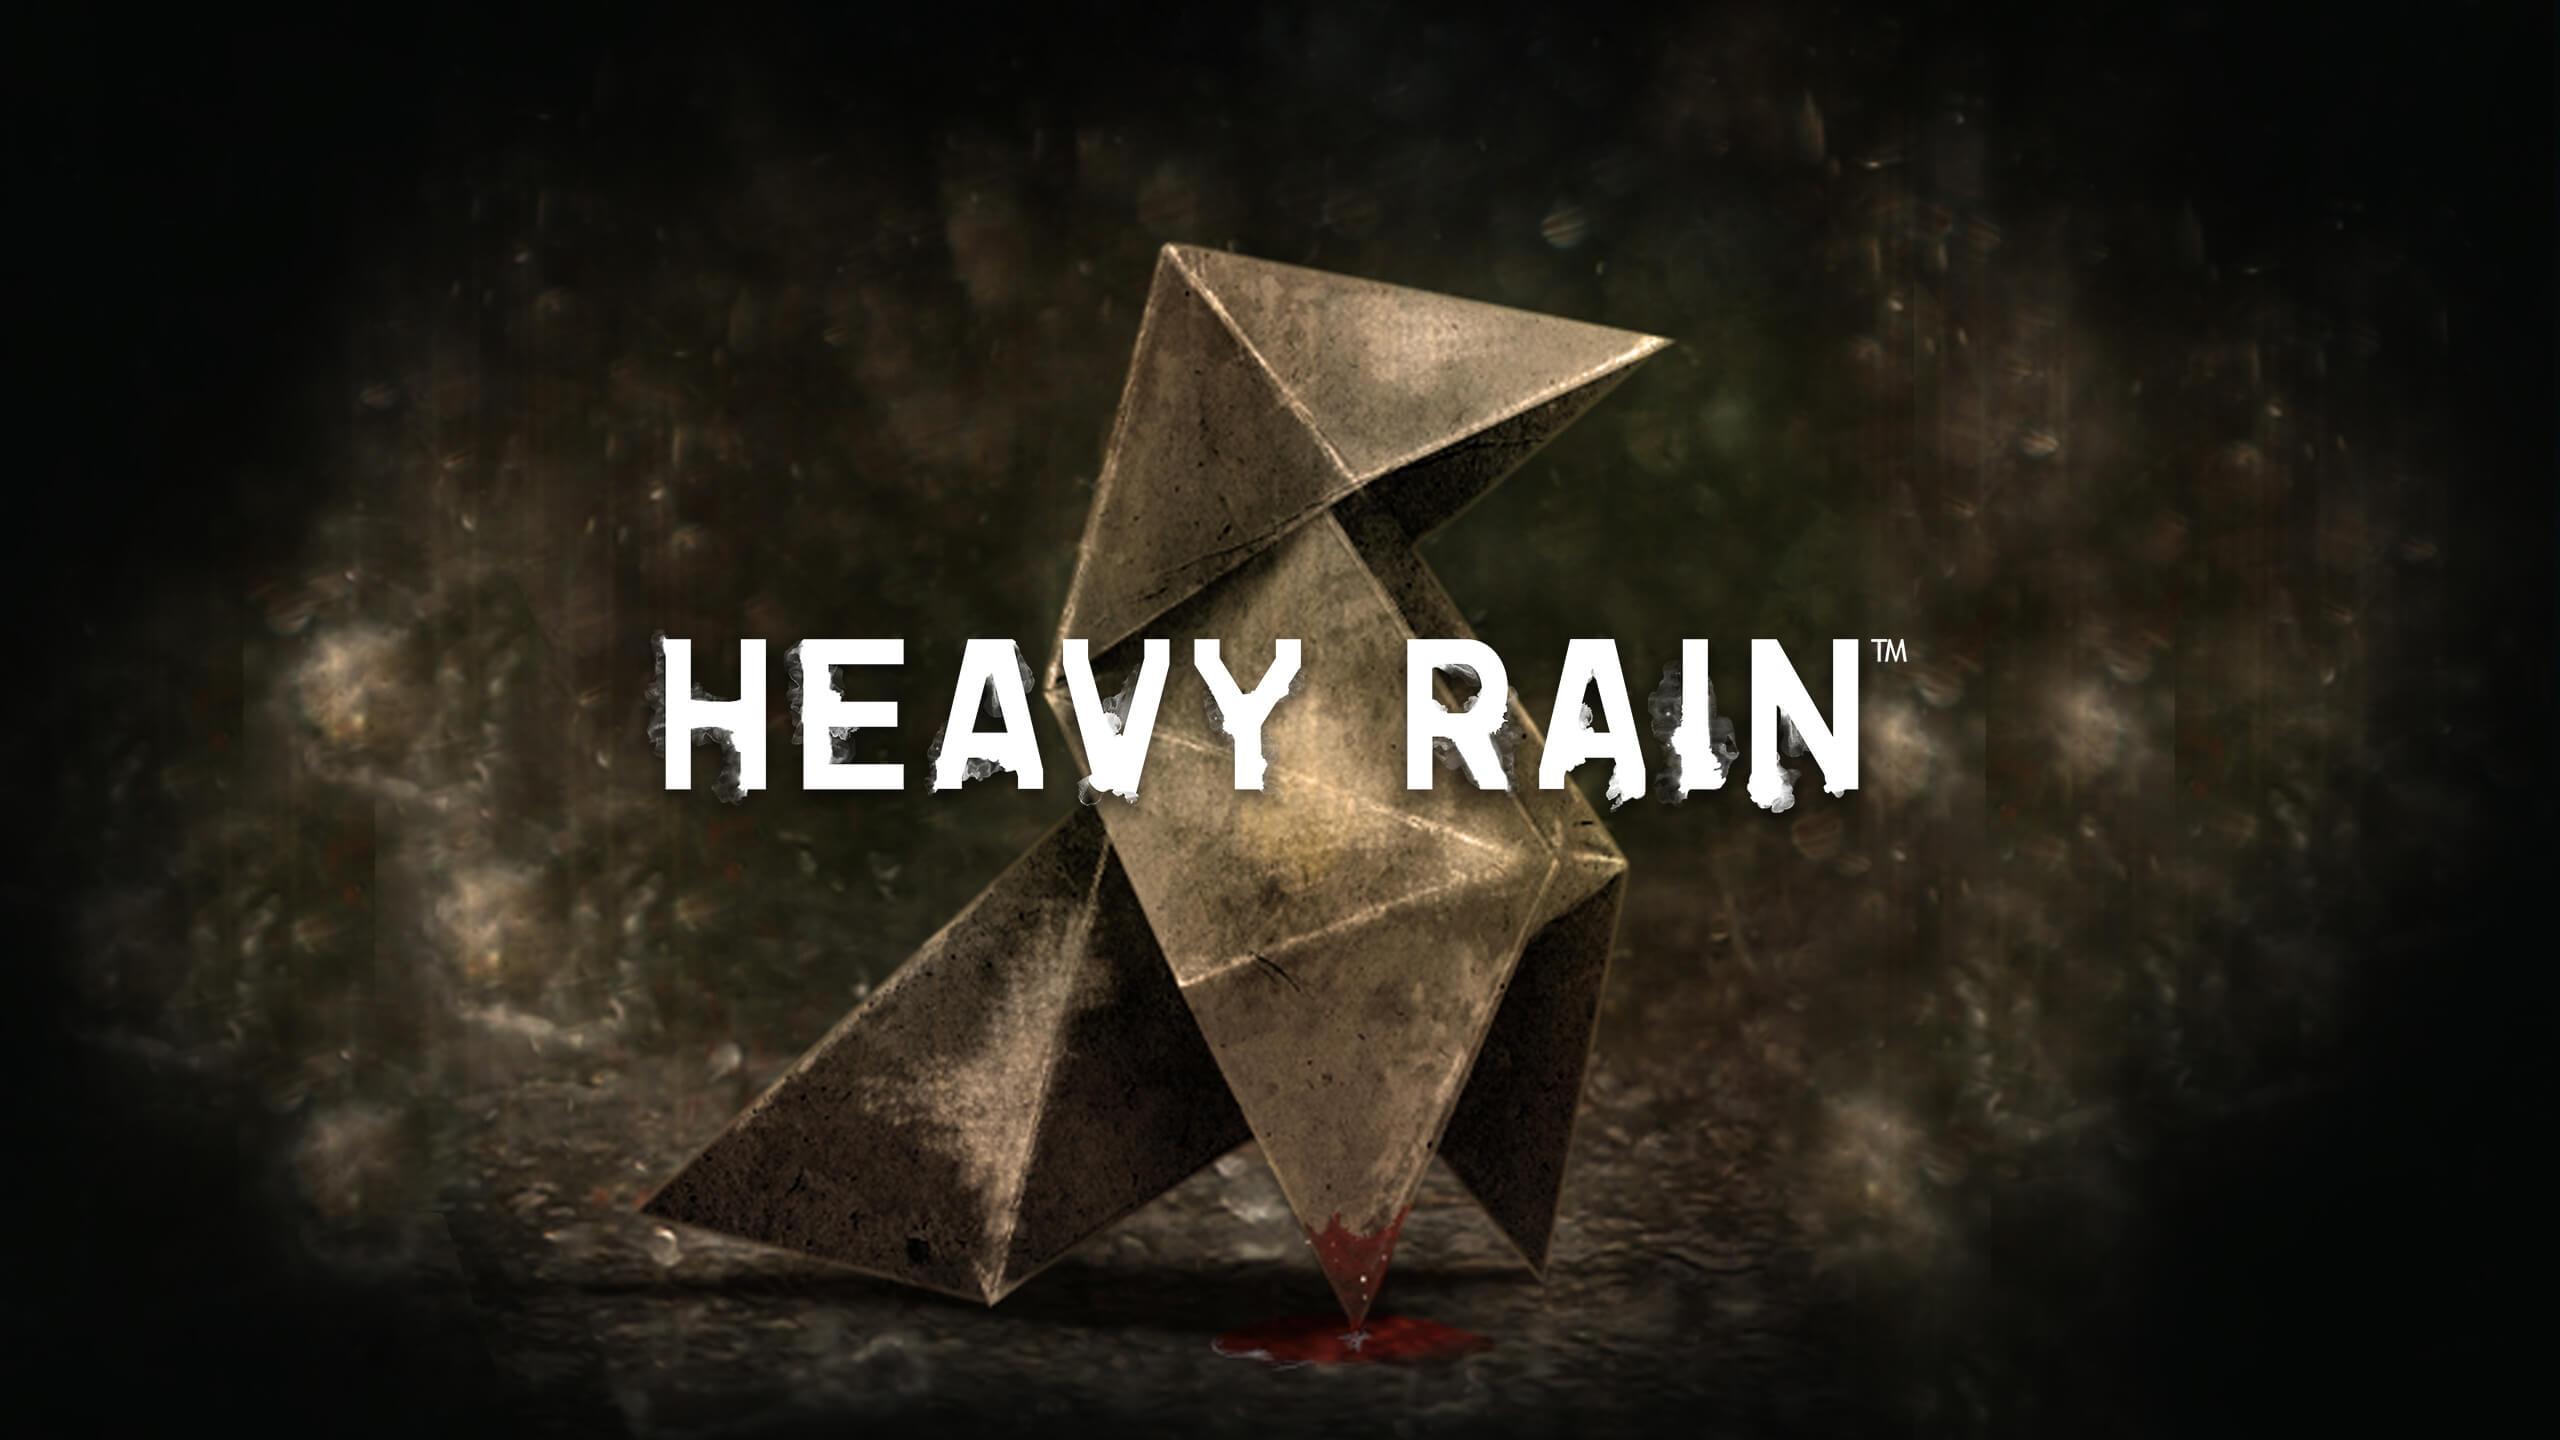 Demo grátis de Heavy Rain já disponível!